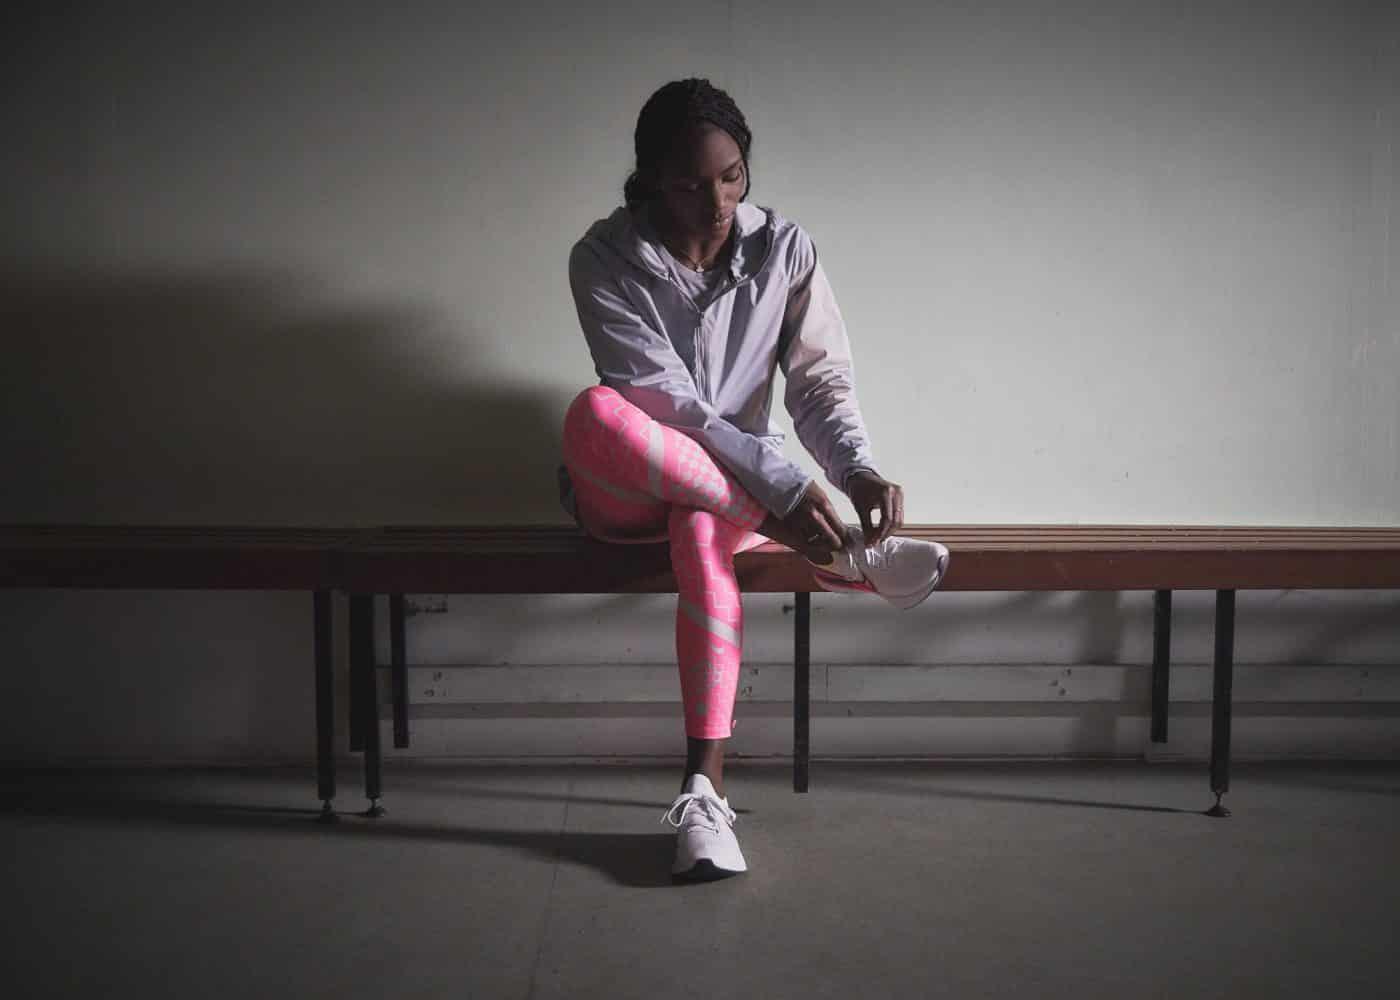 Dina-Asher-Smith-Nike-React-Infinity-Run-Runpack-Tokyo-8